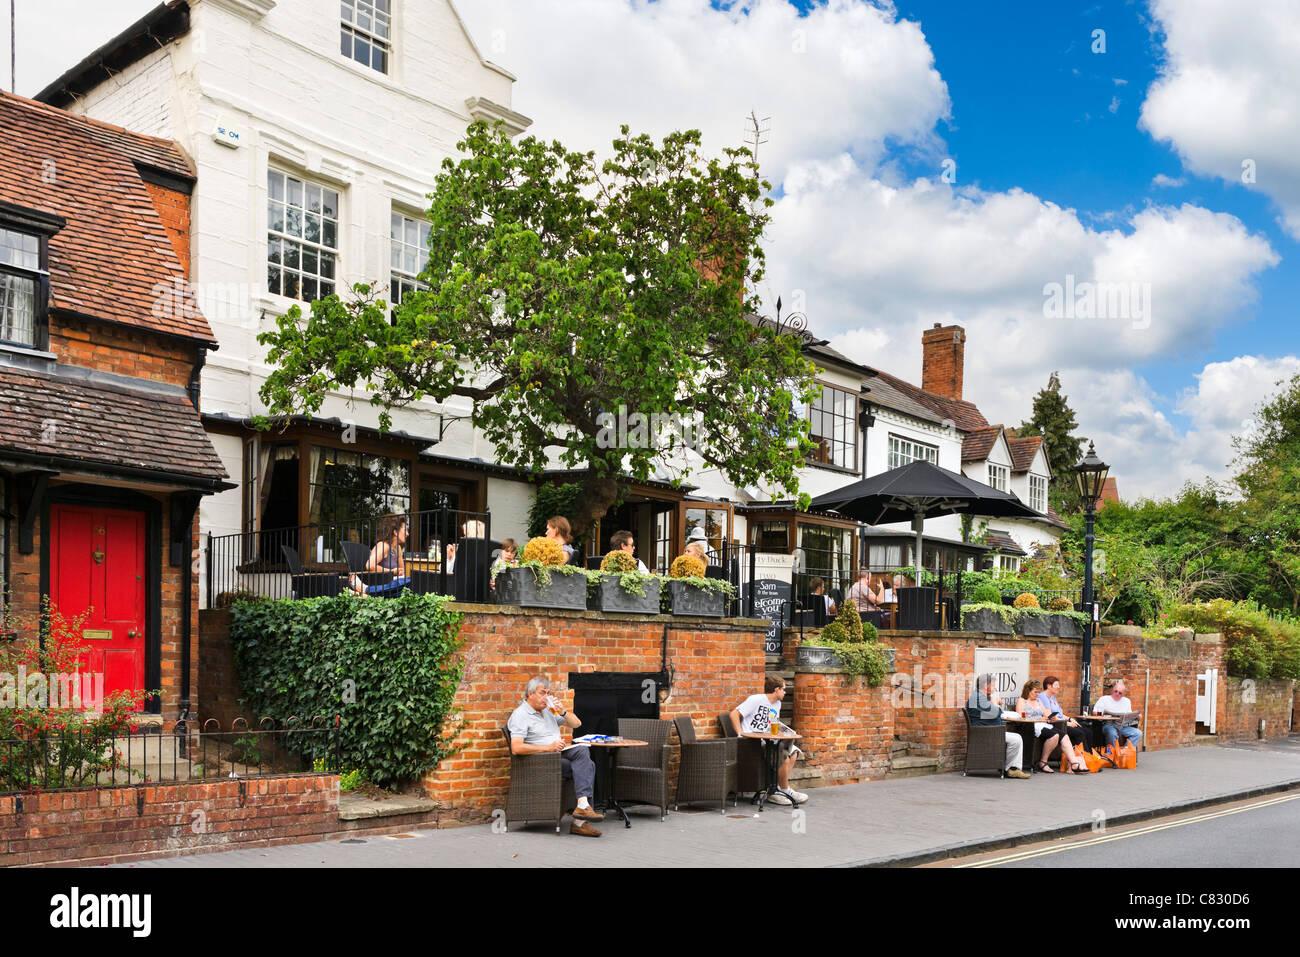 El famoso pato sucio pub cerca del teatro de RSC, Stratford-upon-Avon, Warwickshire, Inglaterra, Reino Unido. Imagen De Stock